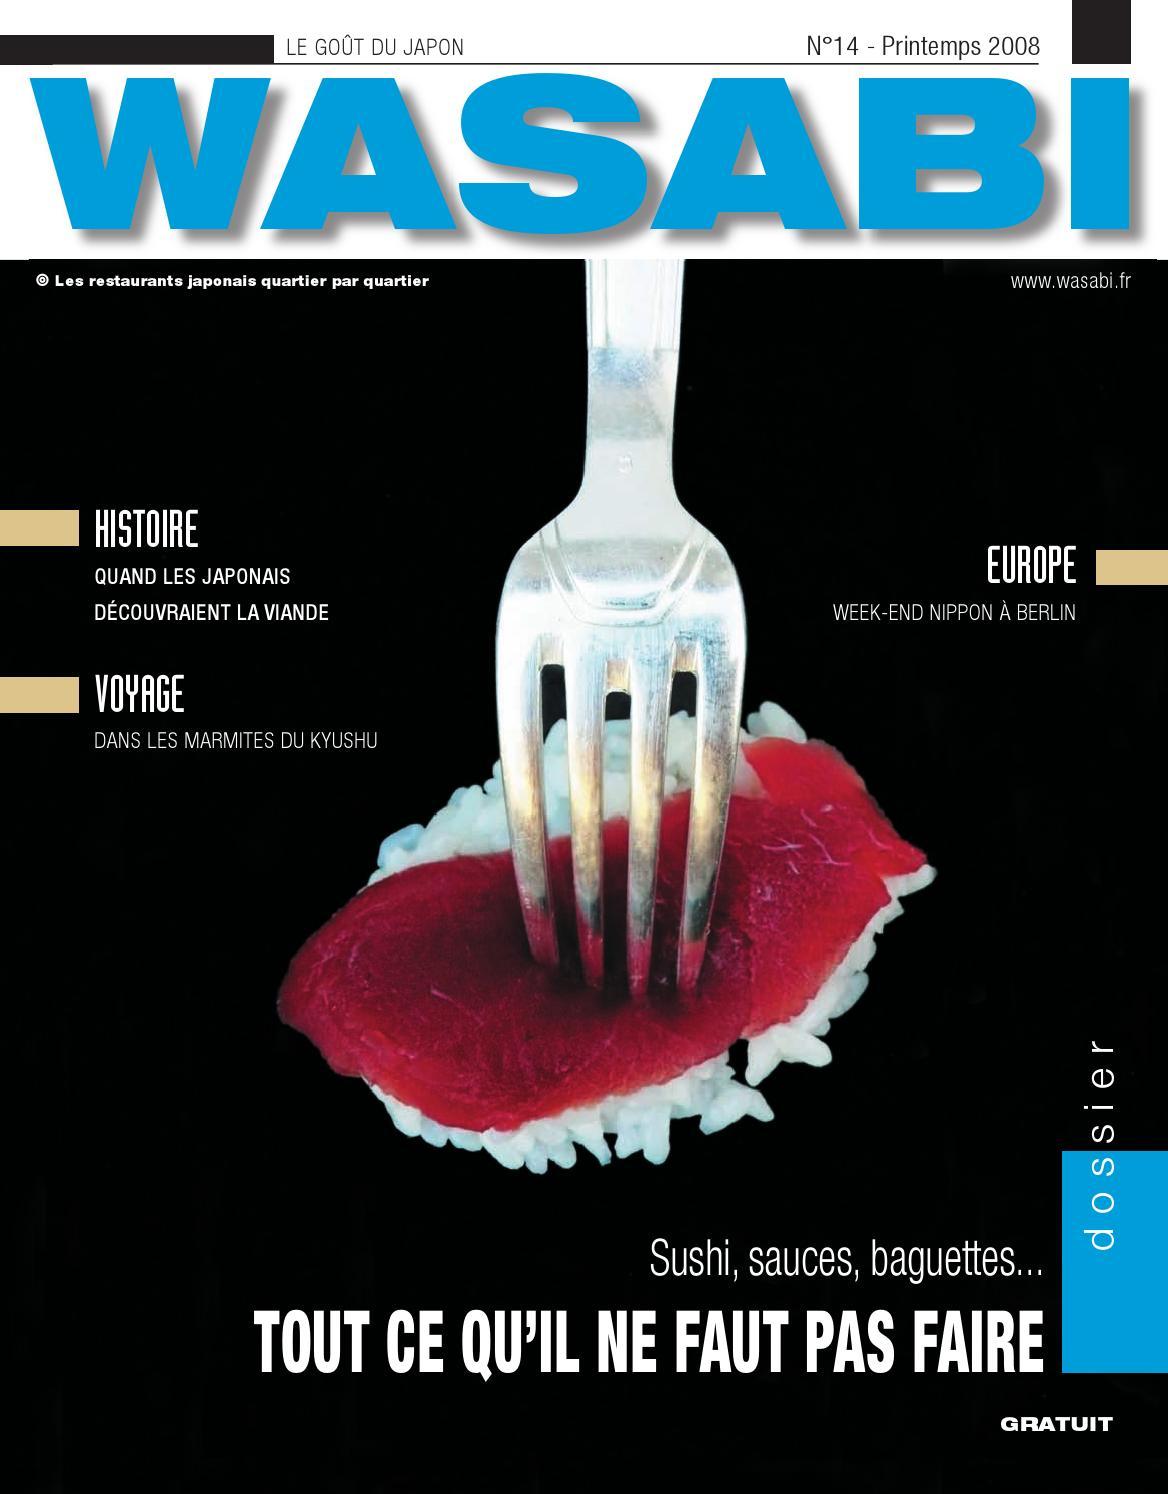 Vita Confort 25 Rue Lecourbe wasabi, le goût du japon n°14wasabi - issuu